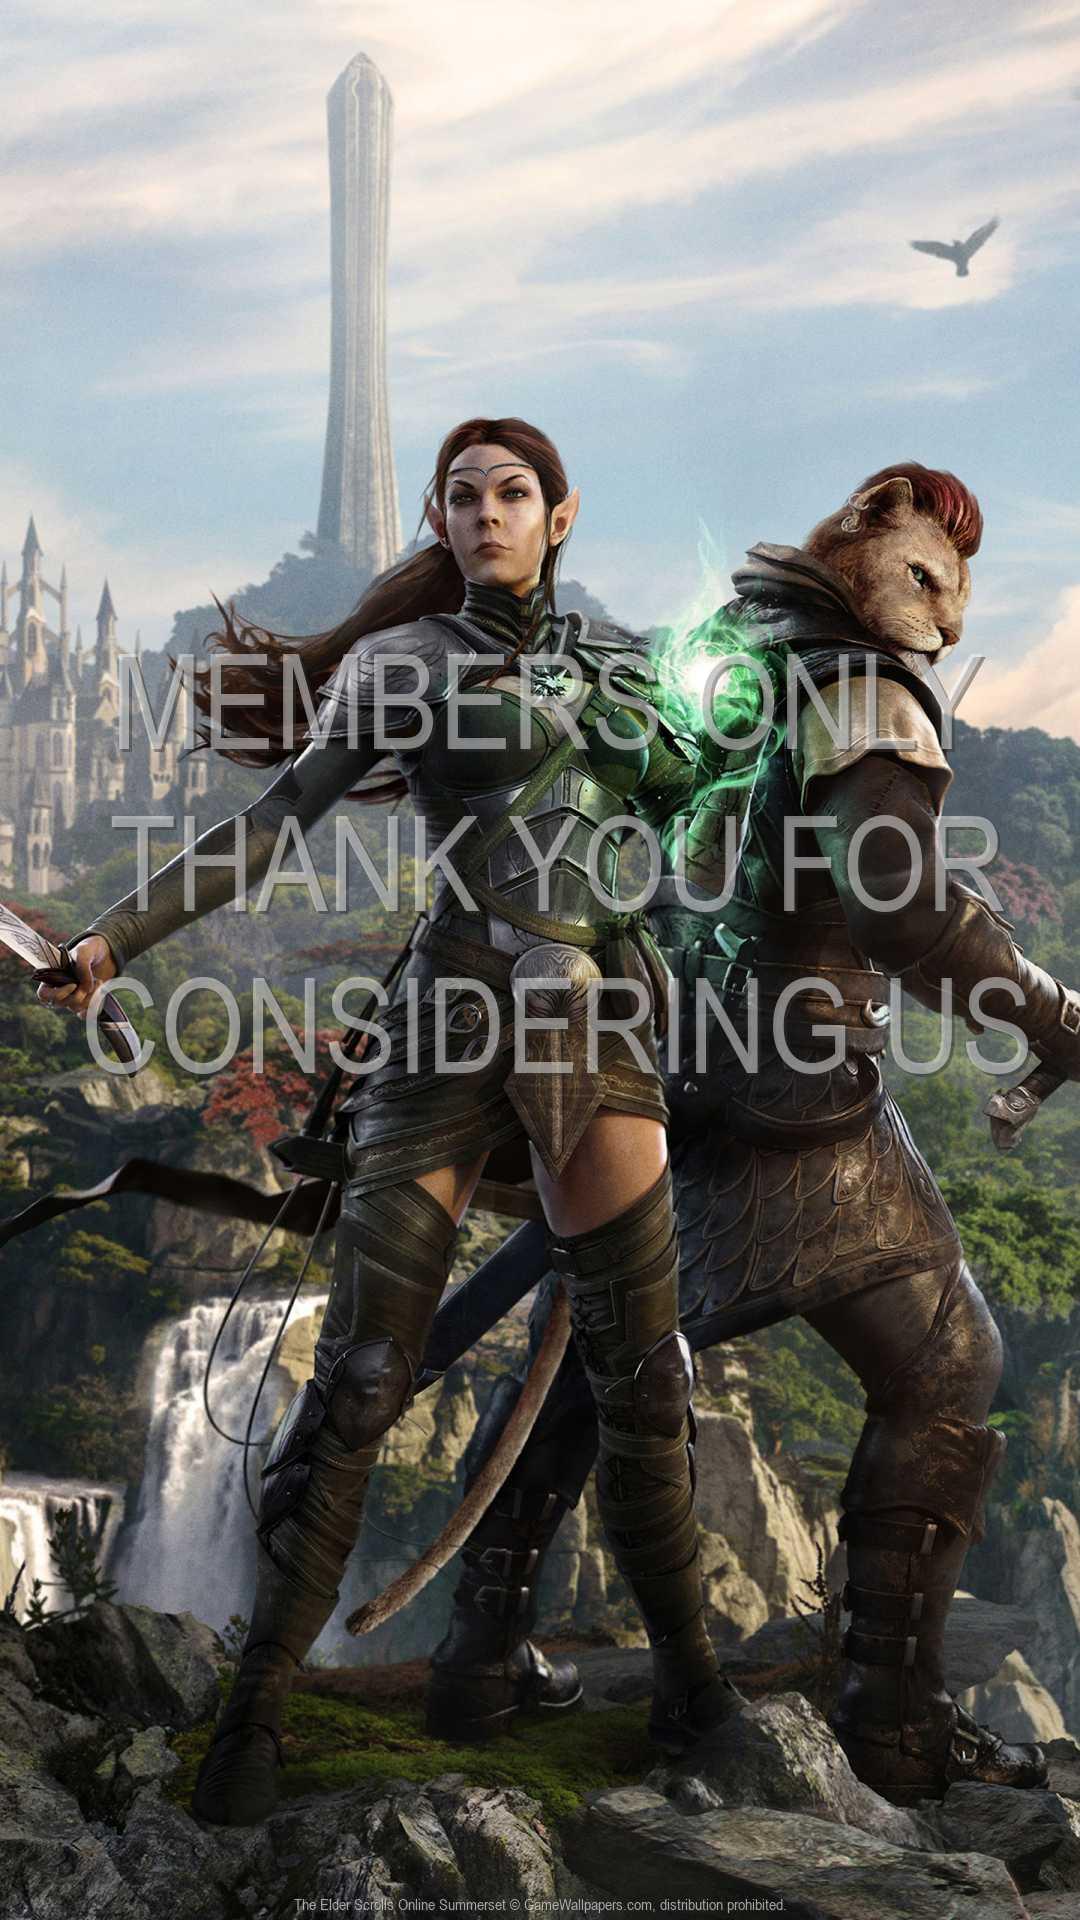 The Elder Scrolls Online: Summerset 1080p Vertical Mobile wallpaper or background 01